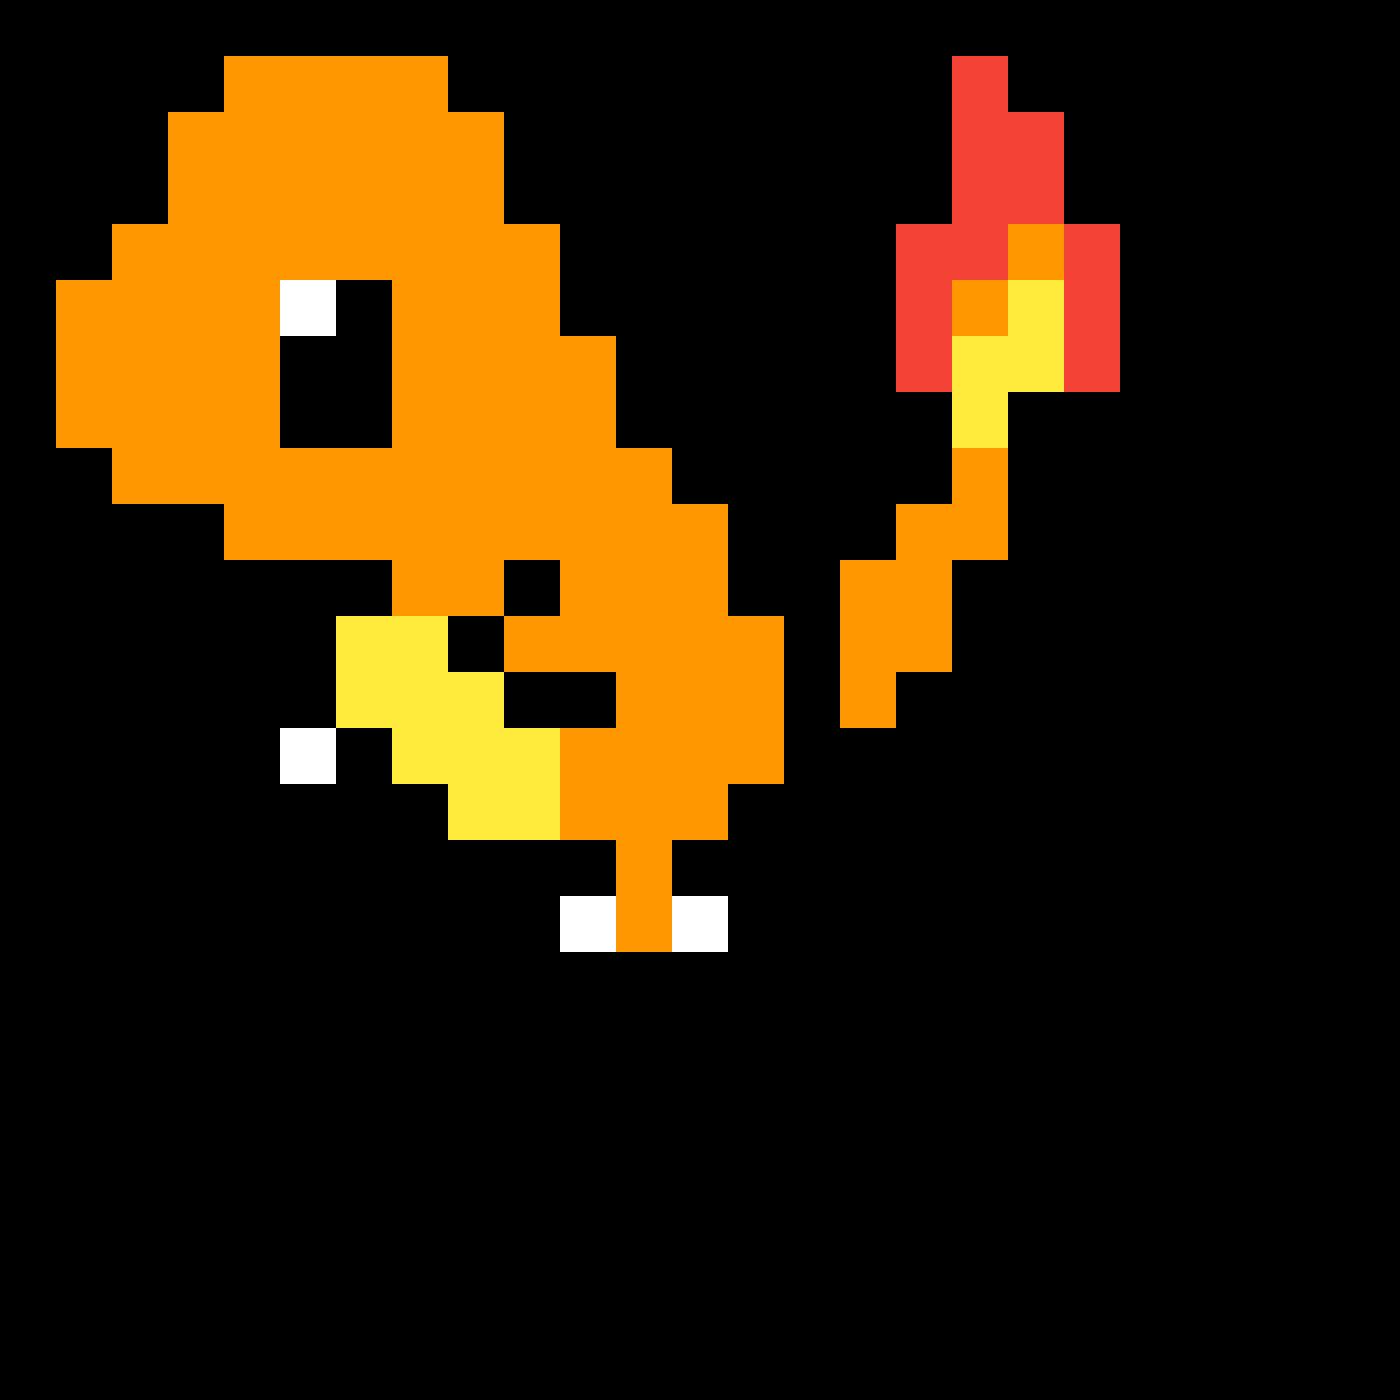 Pikachu Charmander Pixel art GIF.